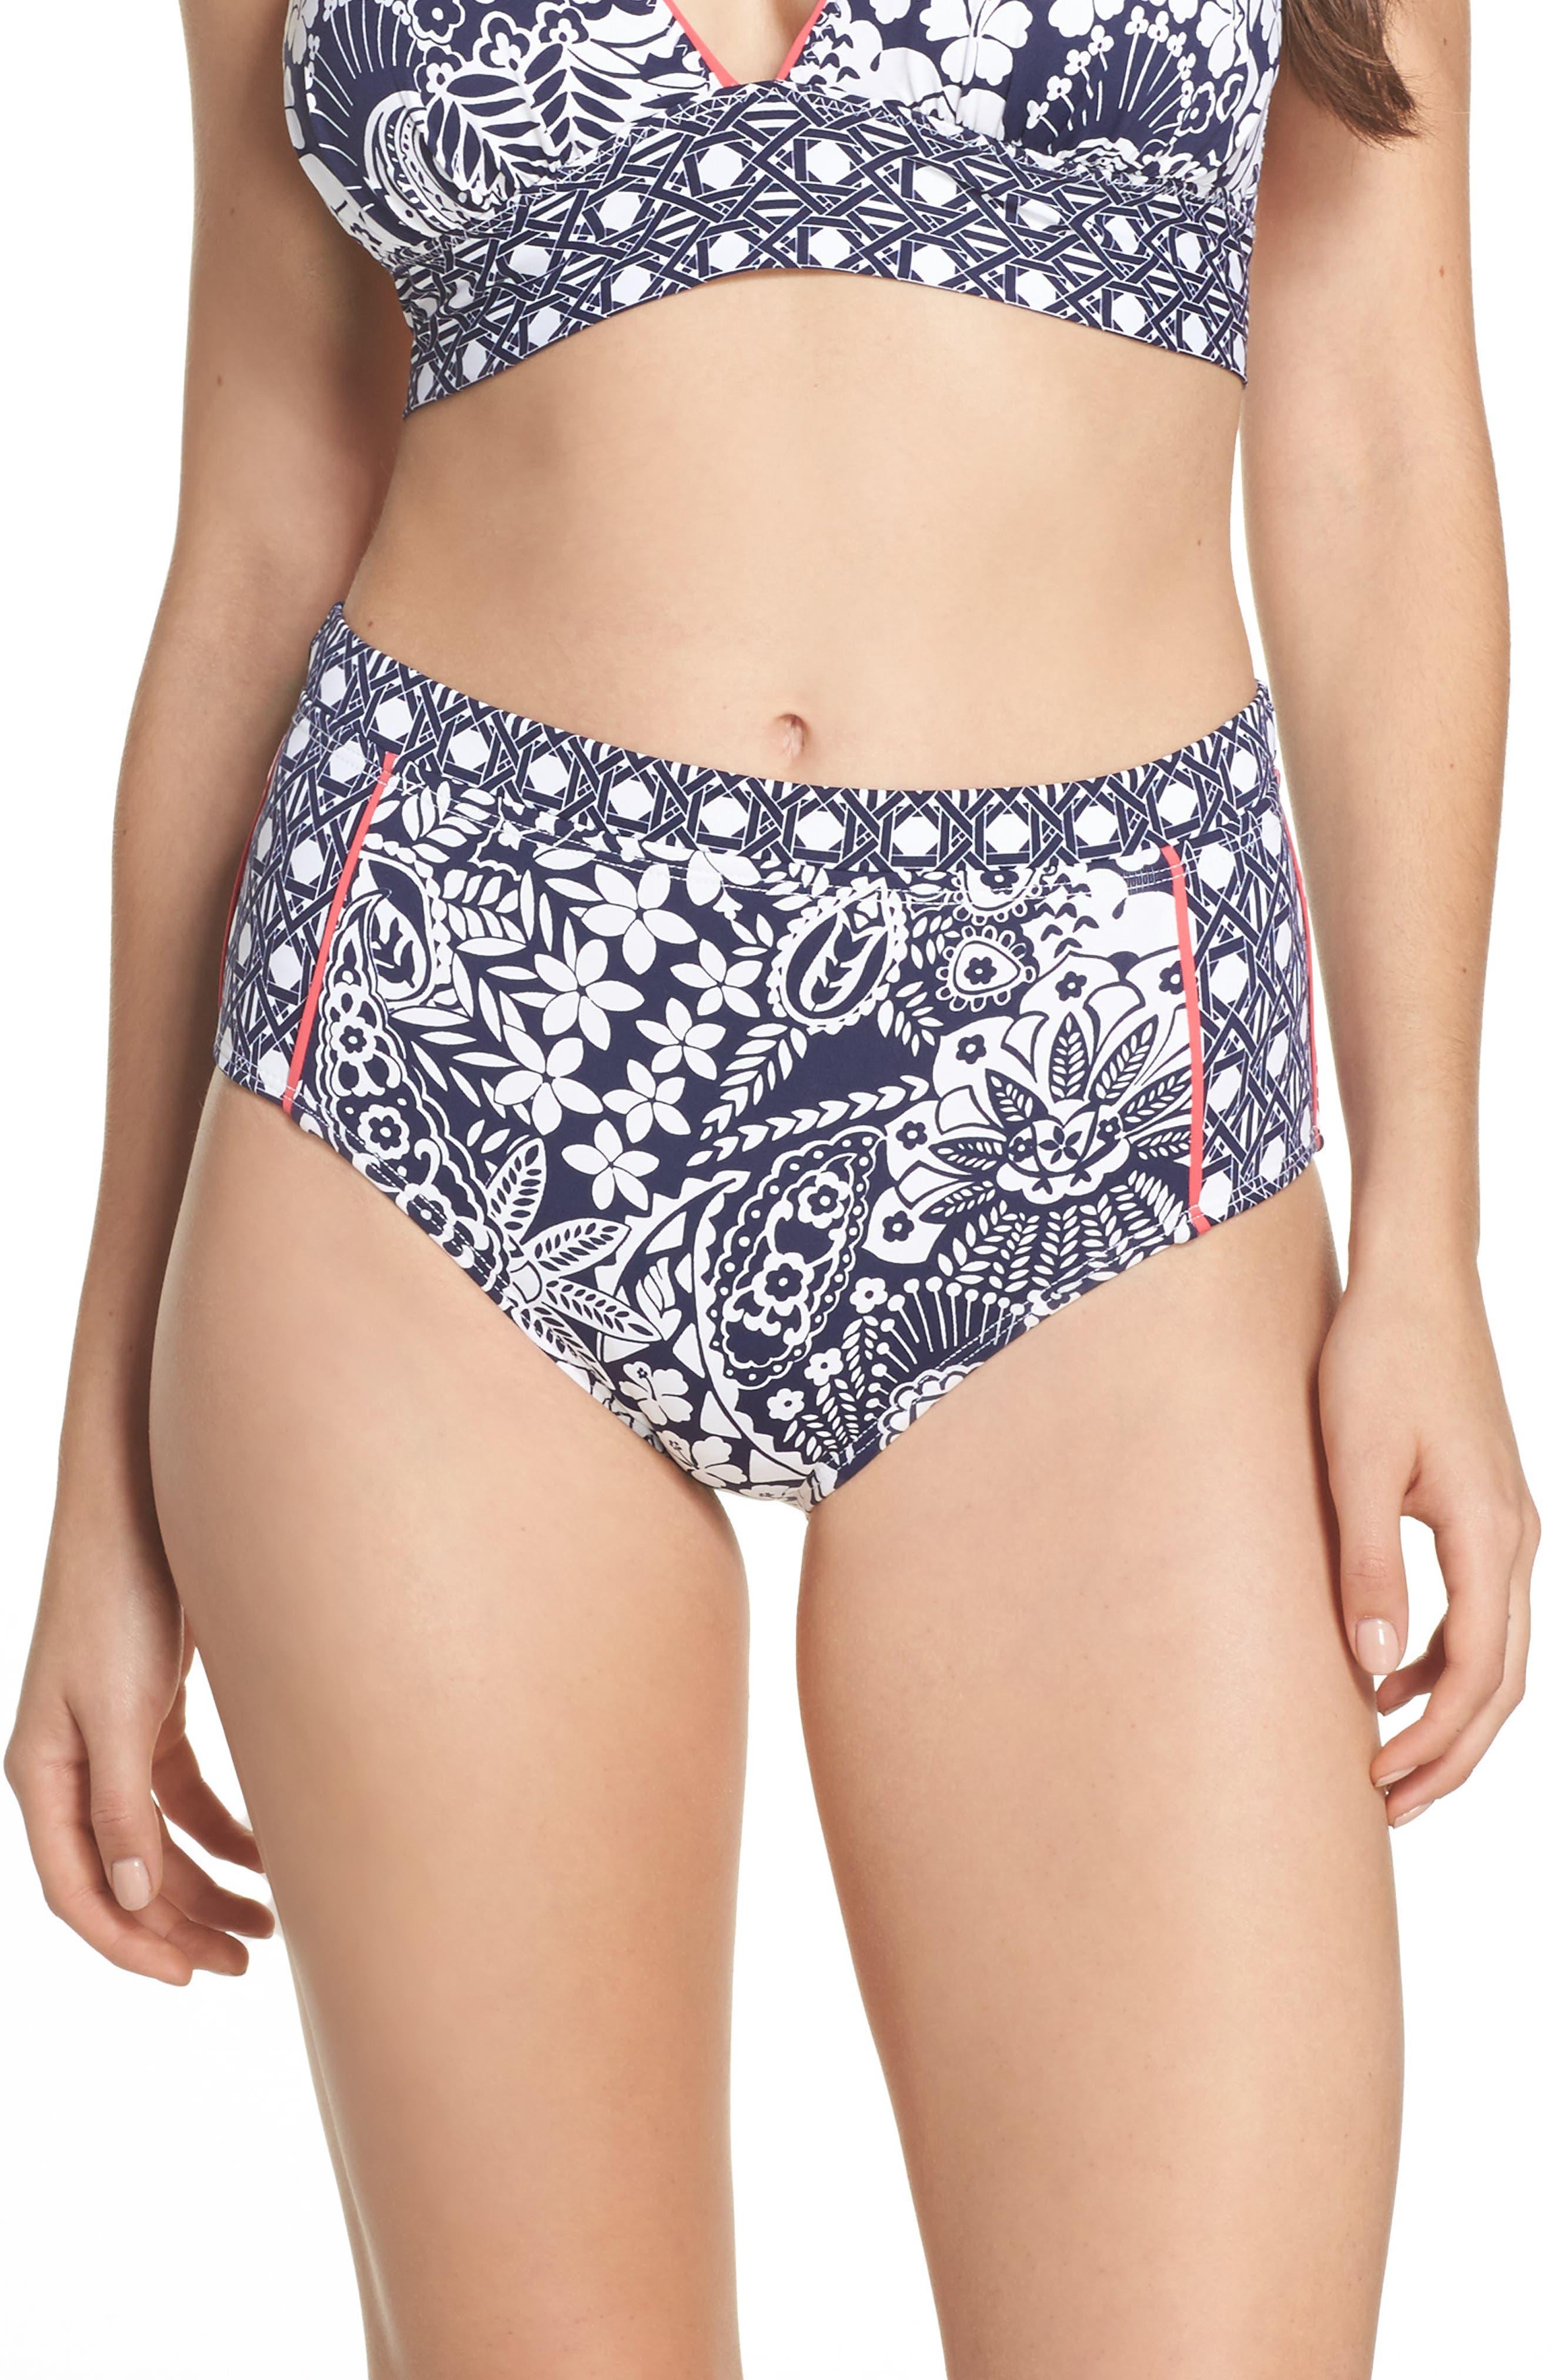 Paisley Paradise High Waist Bikini Bottoms,                             Main thumbnail 1, color,                             Mare Navy